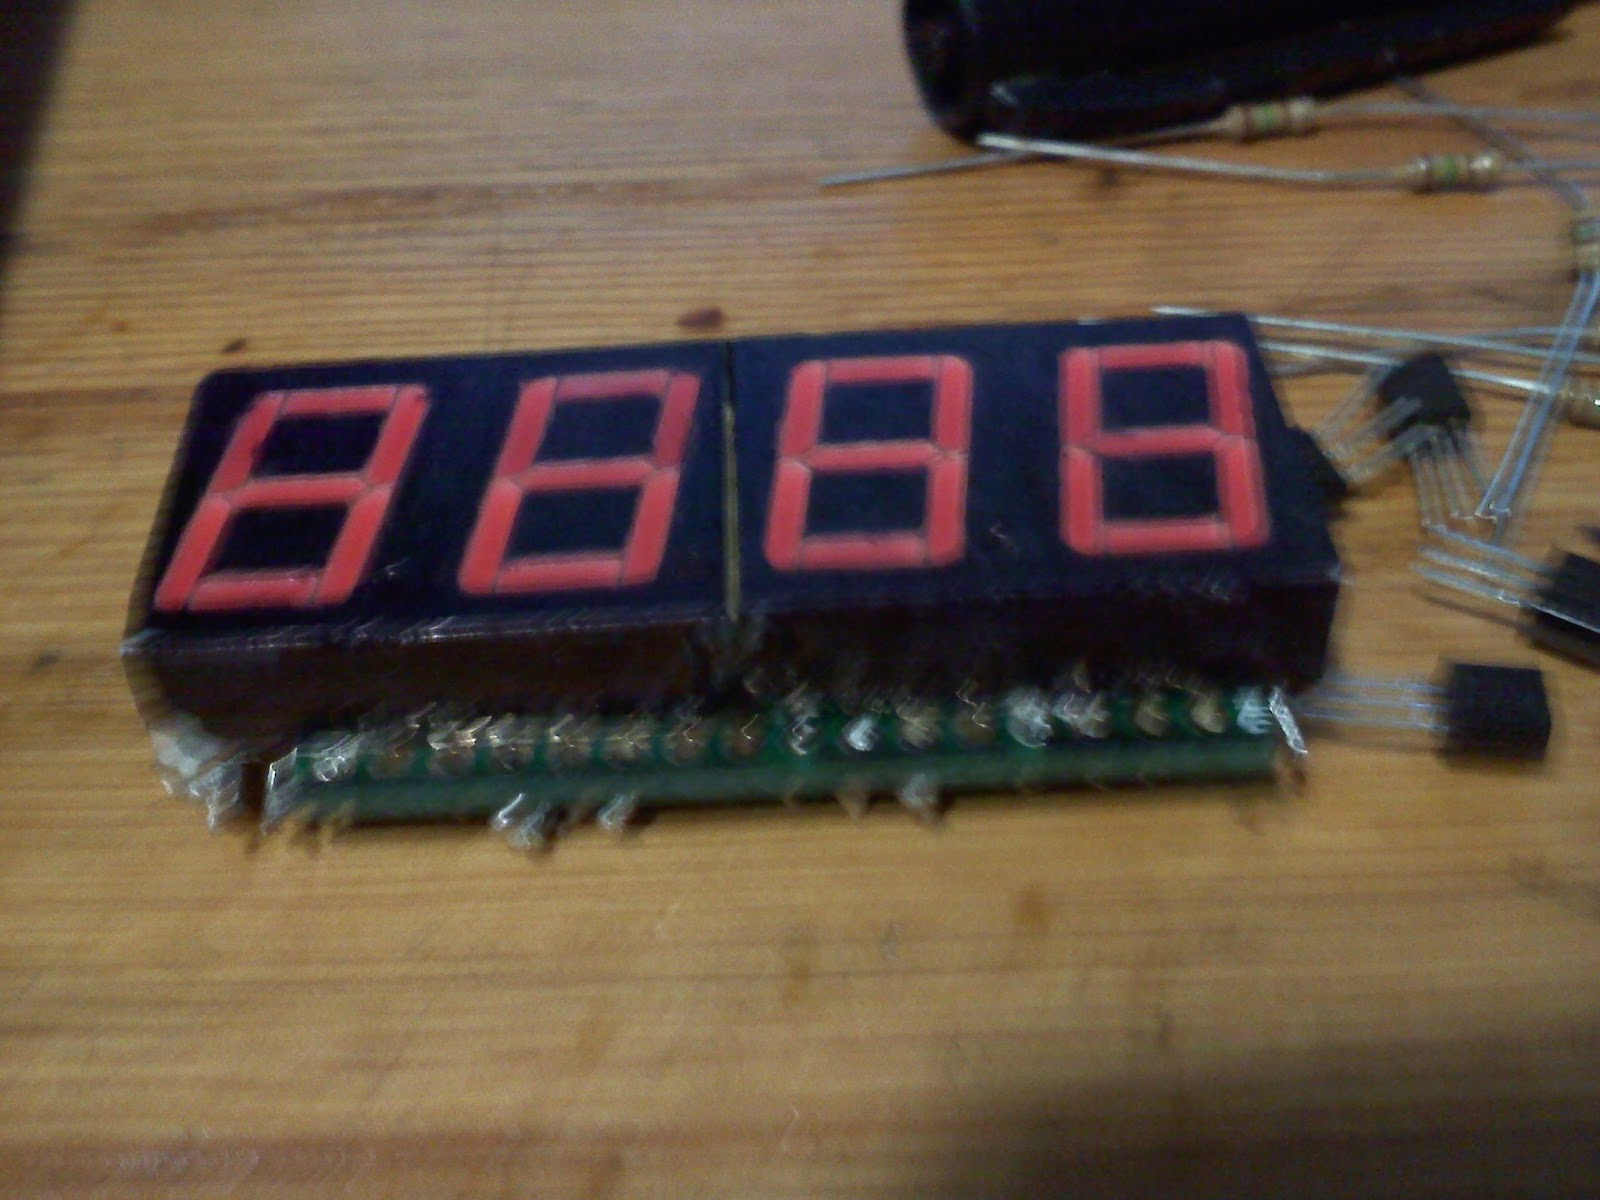 Digitalduino An Arduino Diy Tachometer Display Led Rpm Meter Circuit Diagram For Automobiles Segment